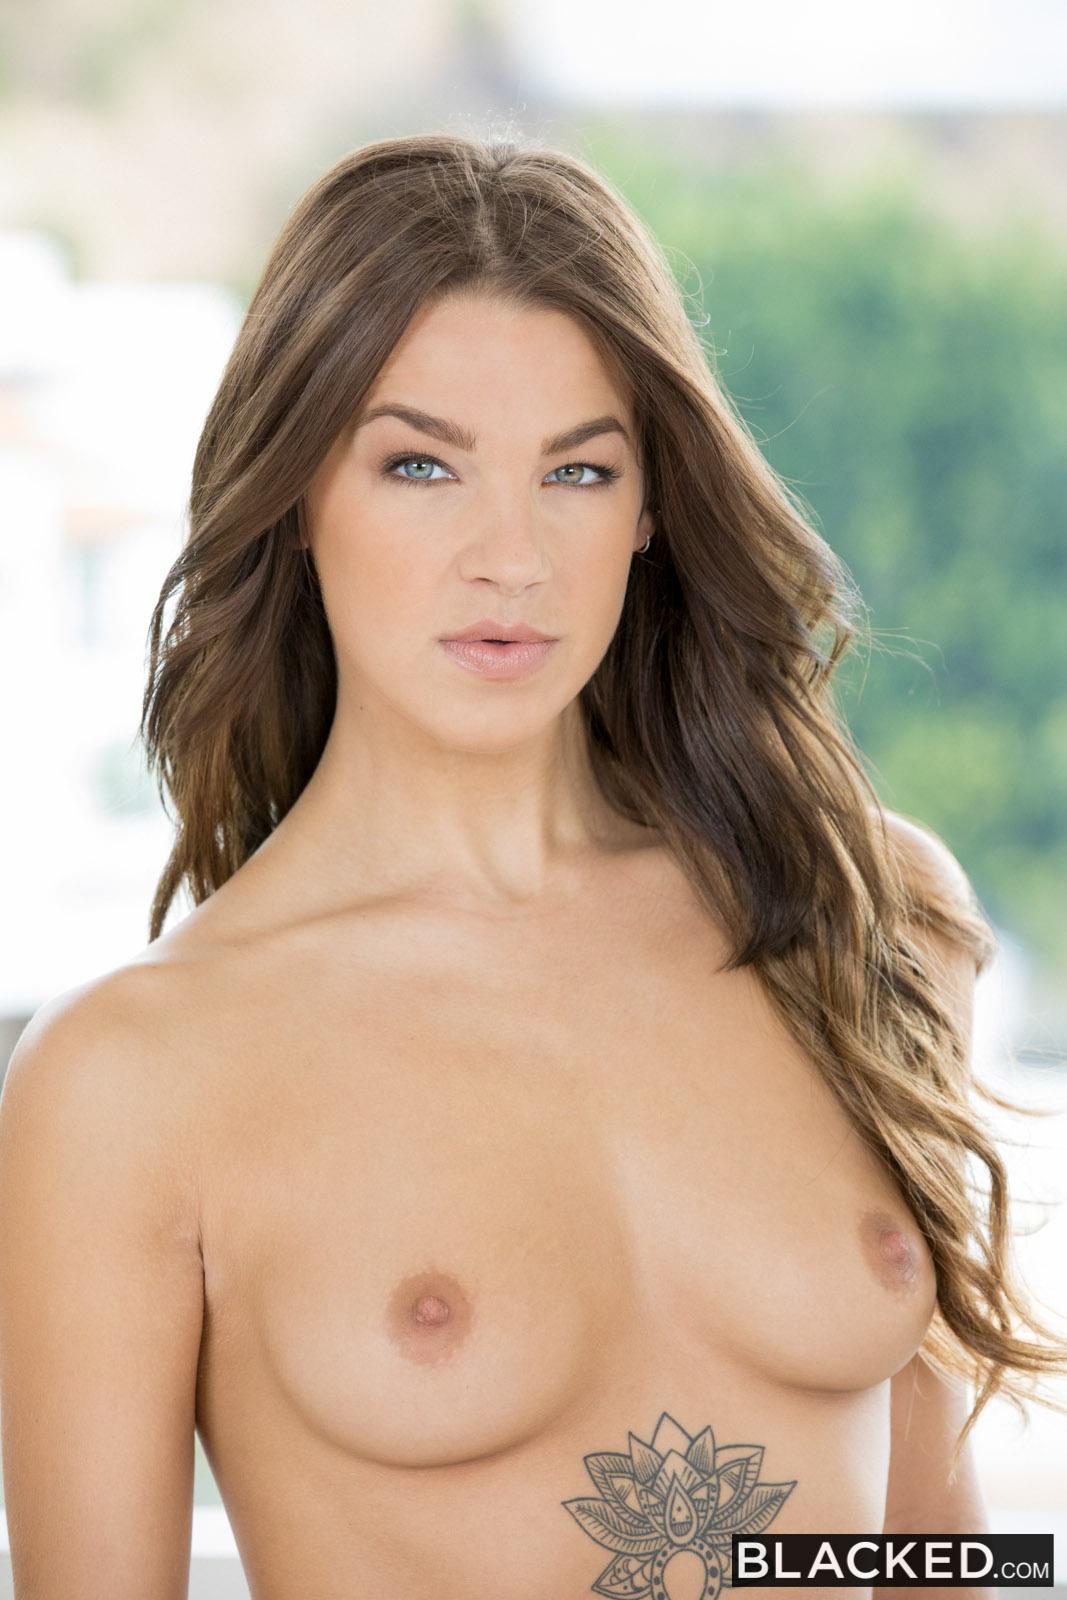 www.sexey naked photo.com